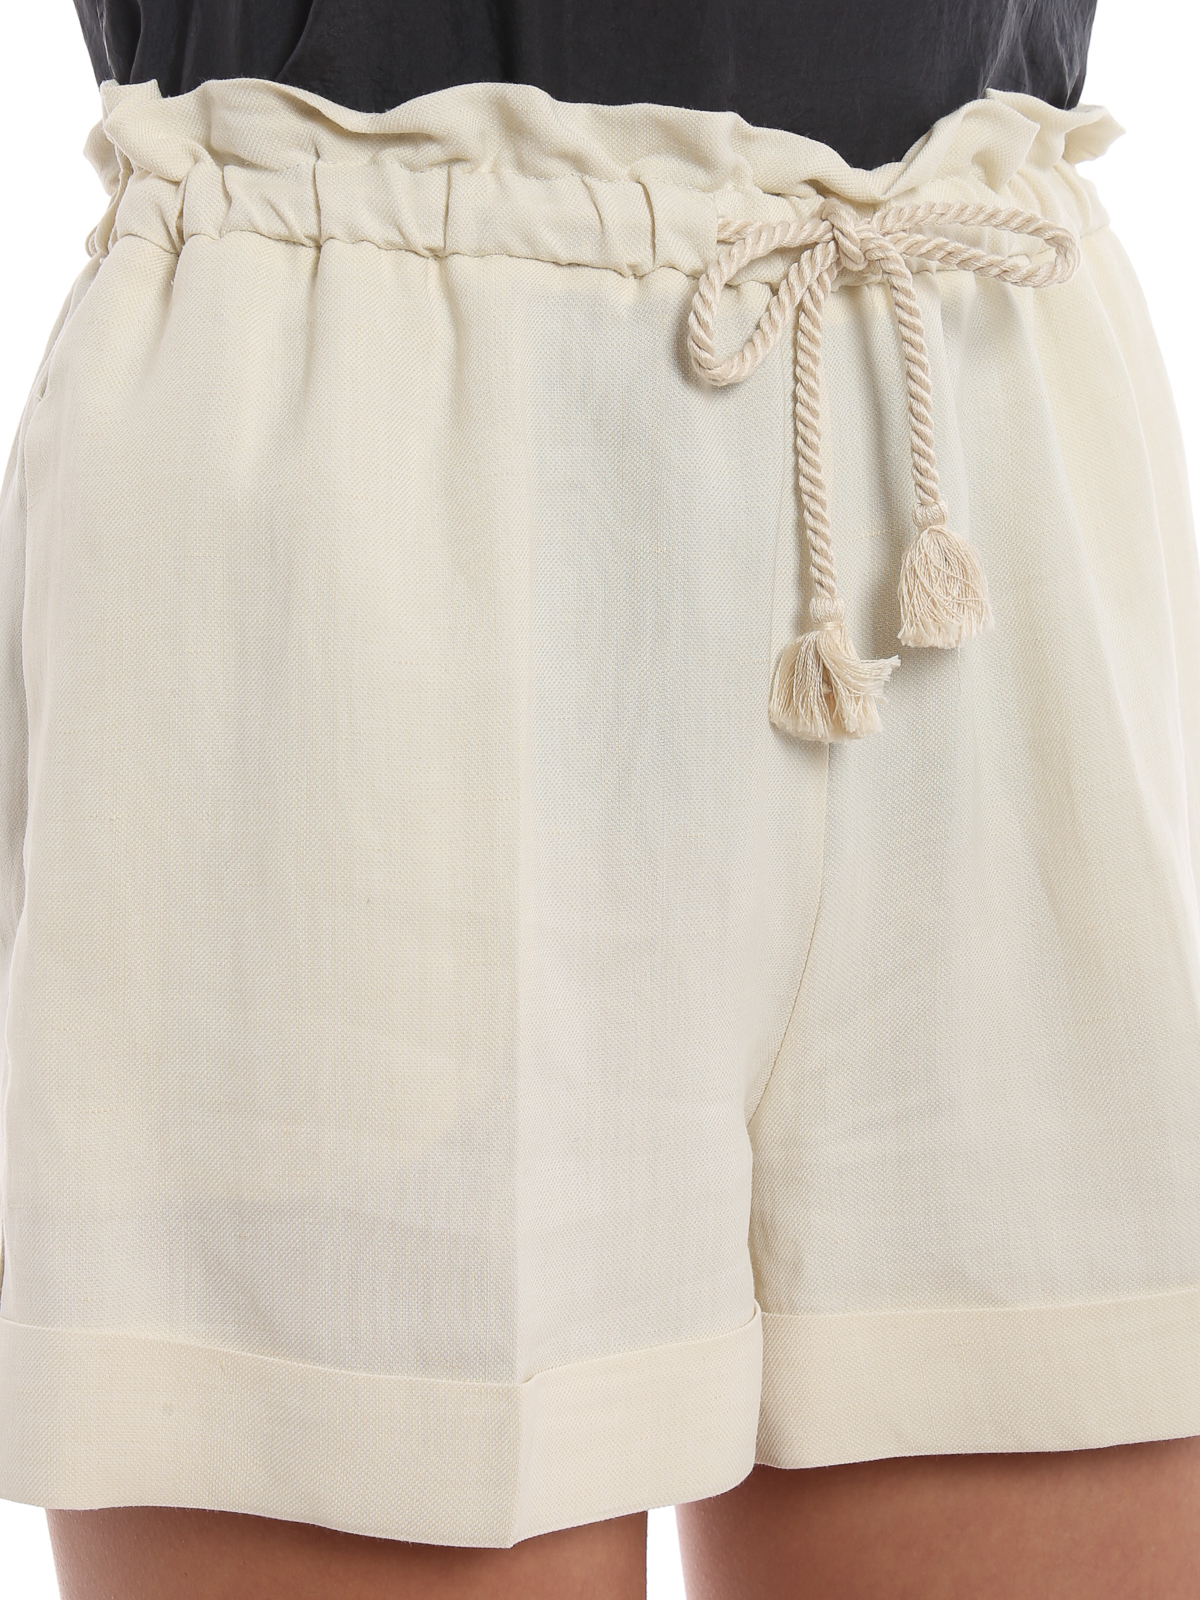 Shorts Color Misto In Pantaloni Avorio Twinset Lino hQrosdxtCB